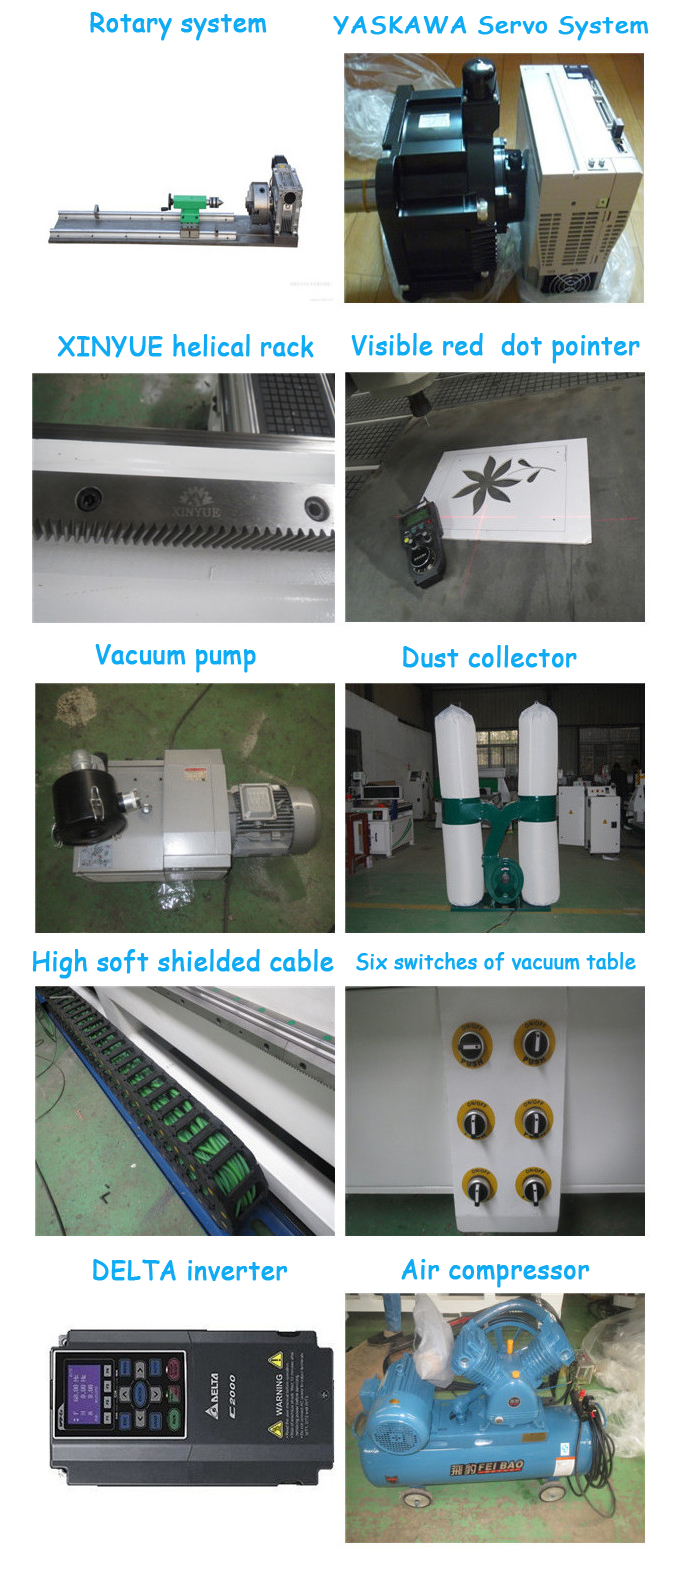 2030 EOT-2/optical reader/TCT-1 computer syntec HSD spindle ATC